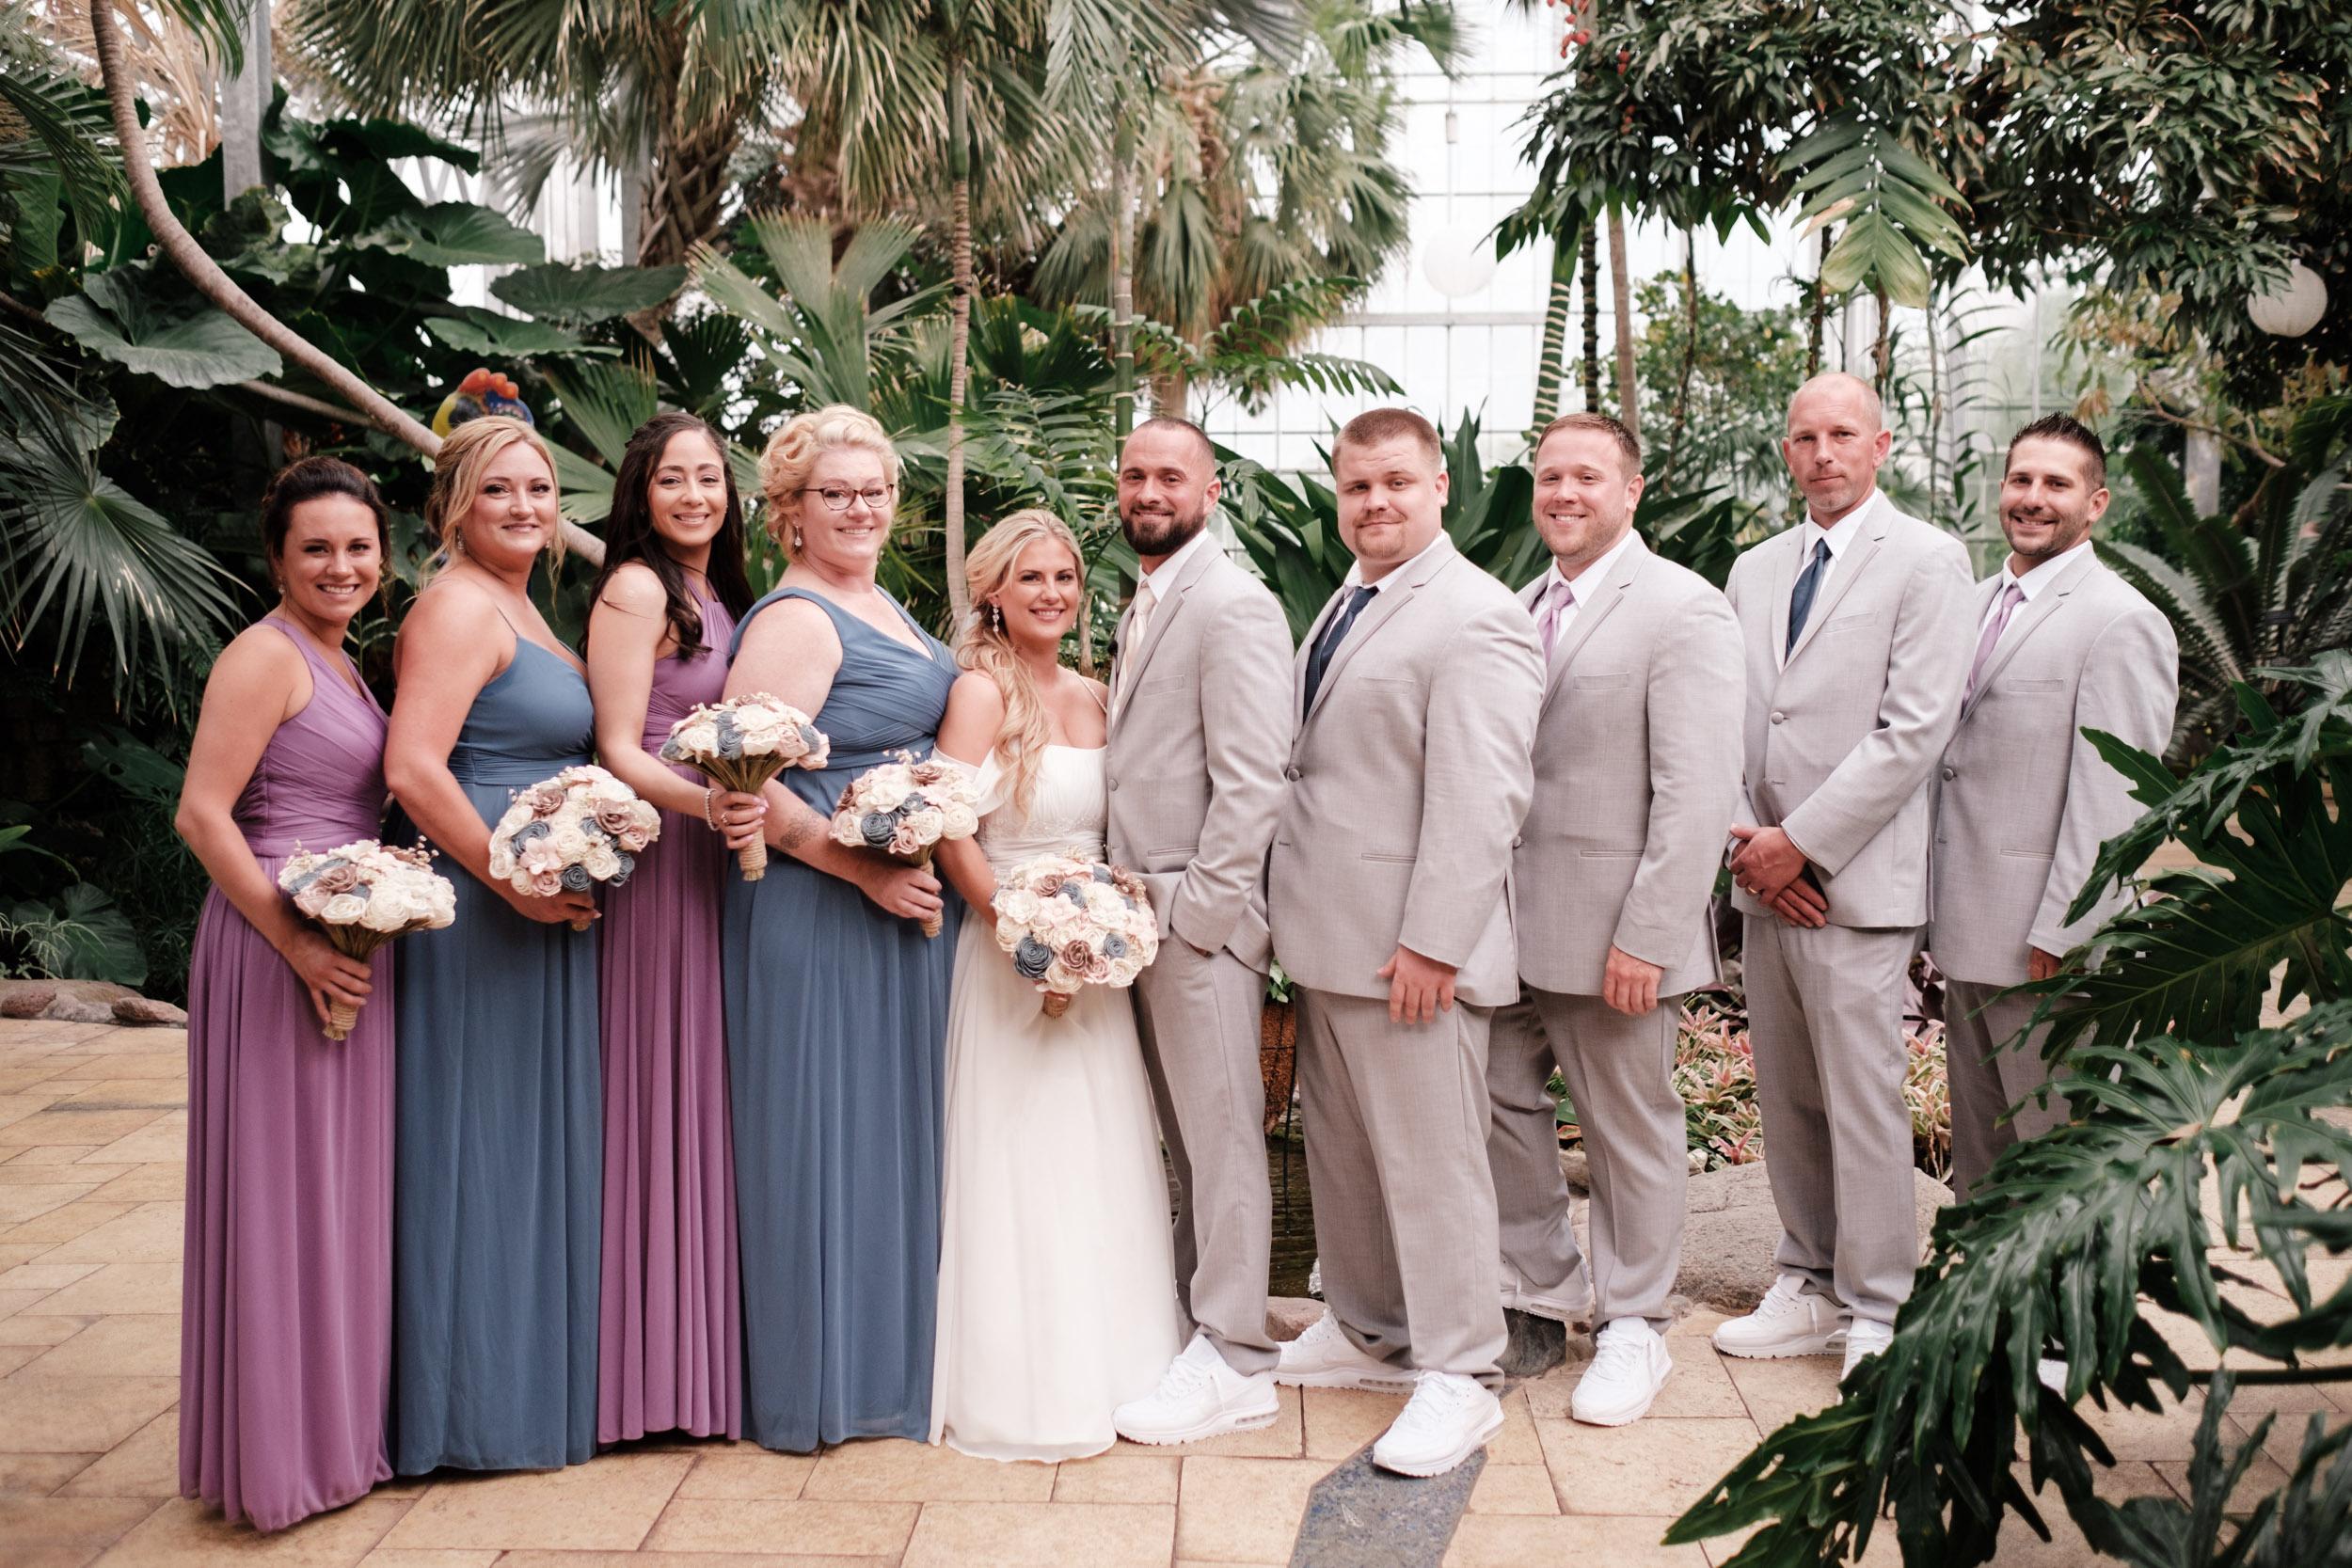 19-06-01 Megan Josh - Nicholas Conservatory Wedding-24.jpg